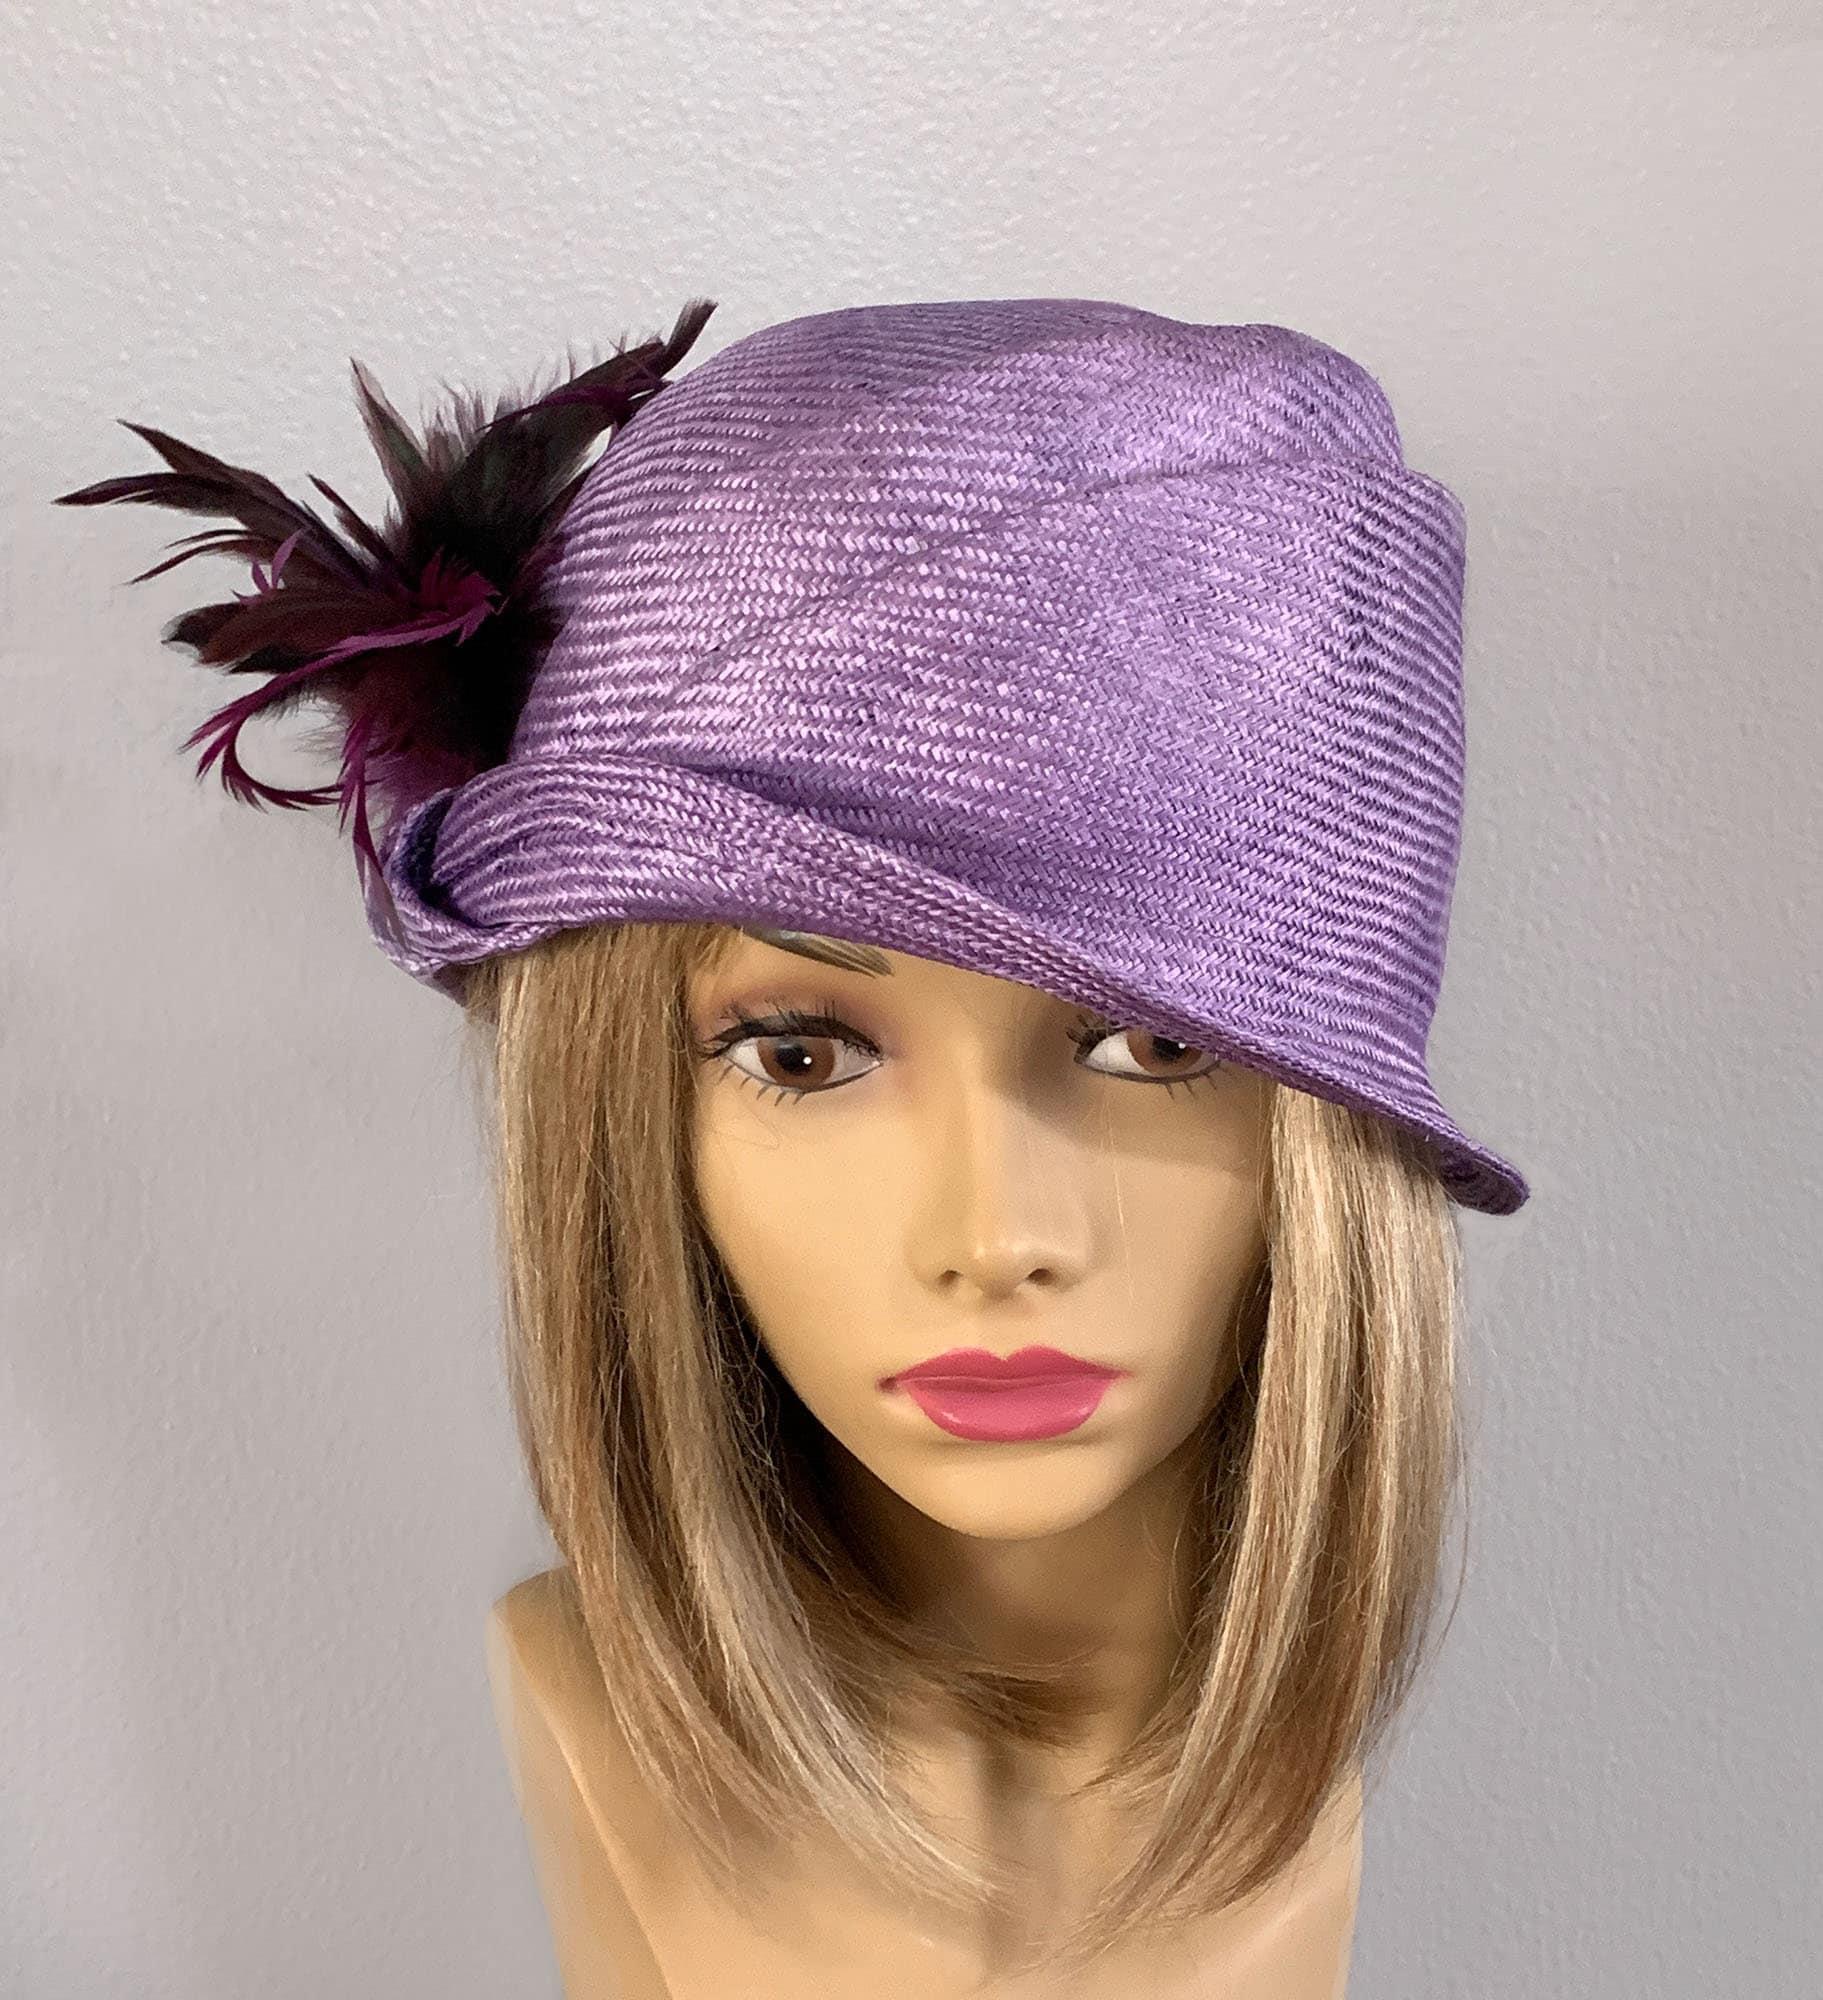 857911be9414ea Sabrina, Kentucky Derby hat, beautiful parasol straw hat with feathers,  cloche, women millinery flapper hat Downton Abbey, purple